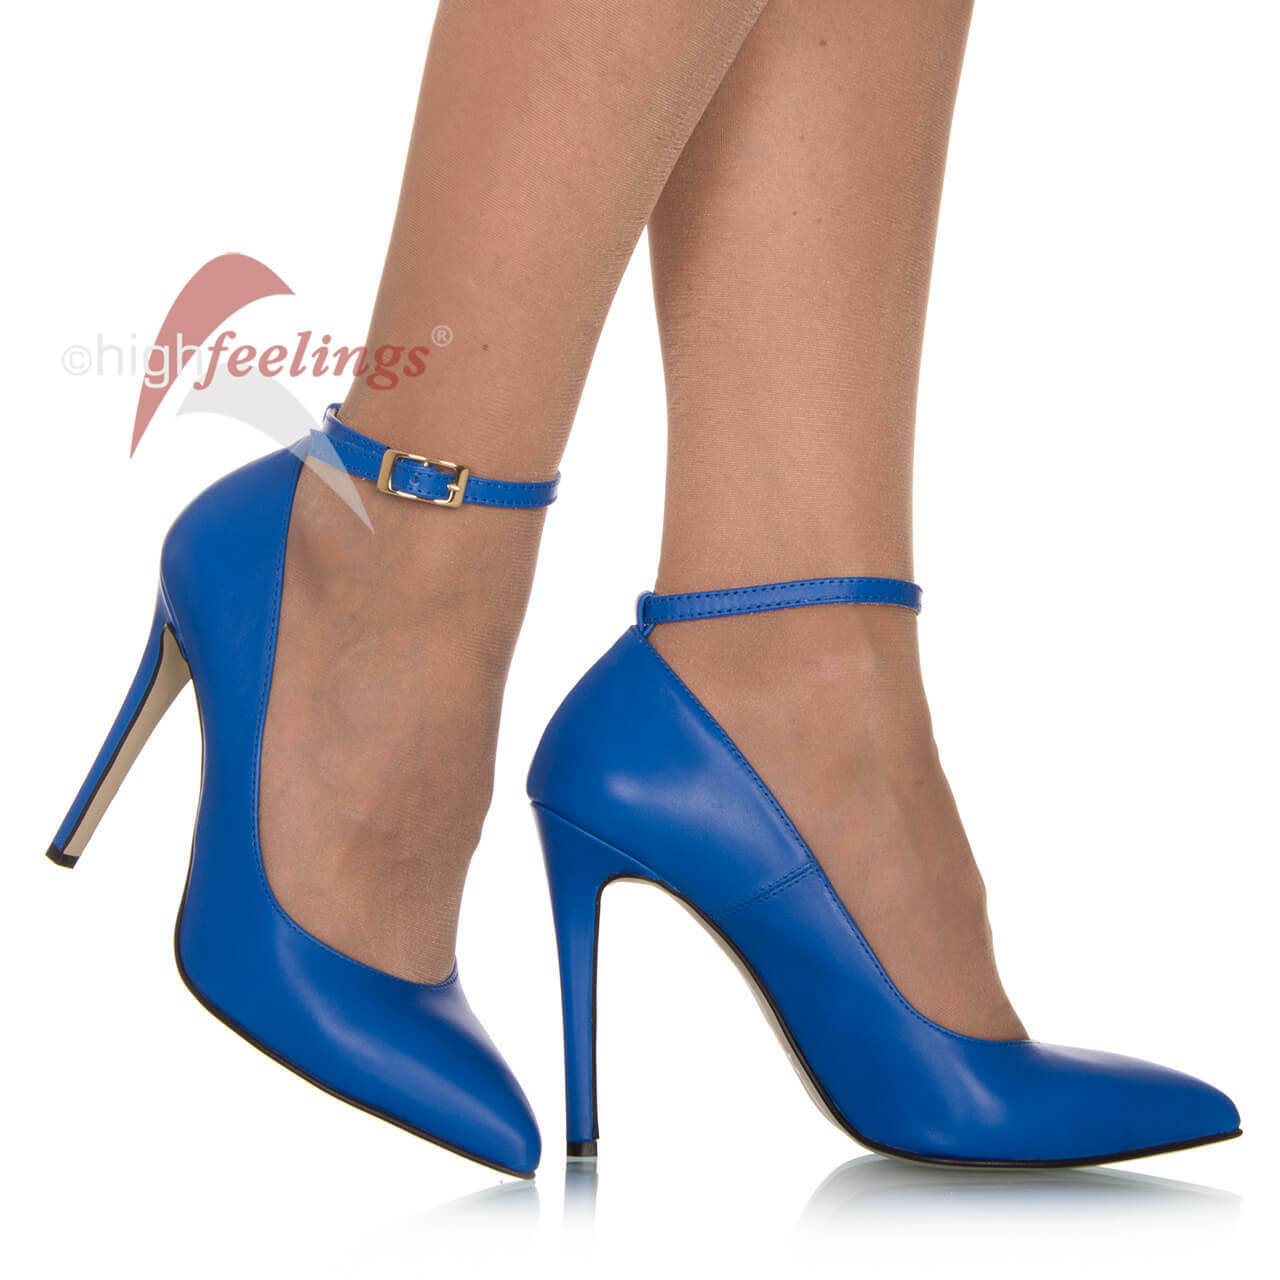 Cinturino alto, DA DONNA PUMPS blu tacco alto, Cinturino paragrafo 10,5 12 cm cuoio mis. 36 47 dcf02a